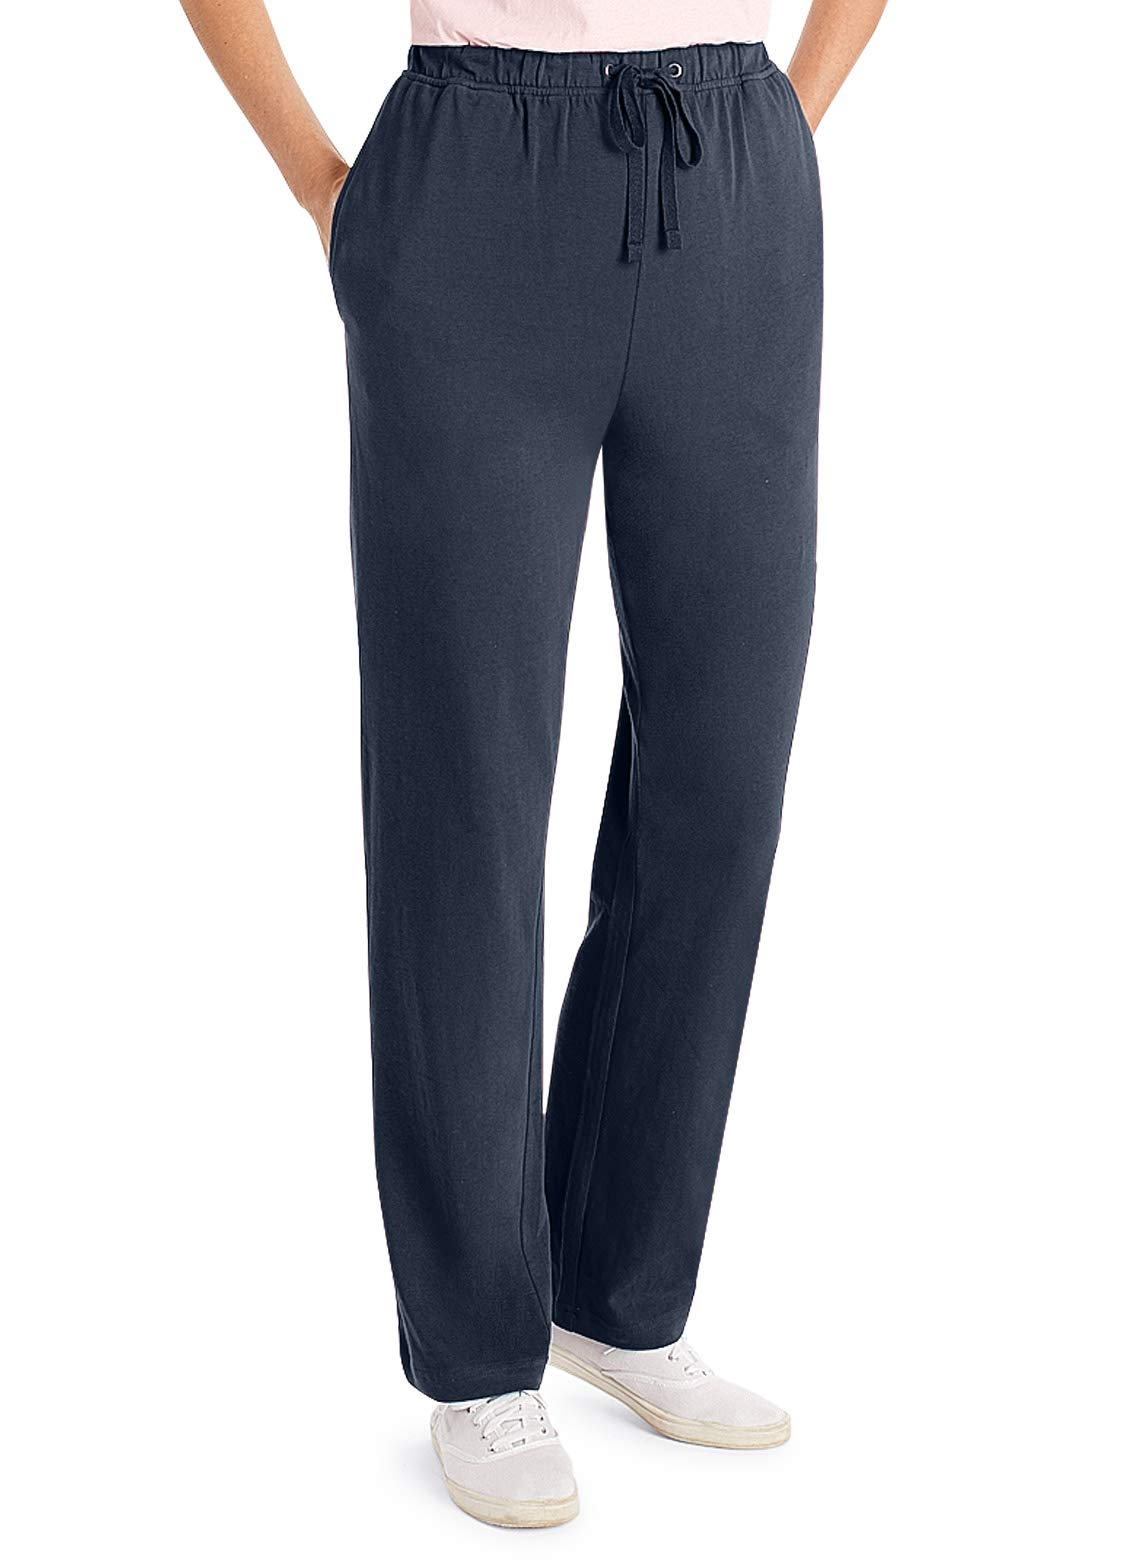 Carol Wright Gifts Jersey Knit Pants, Color Navy, Size Large, Navy, Size Large